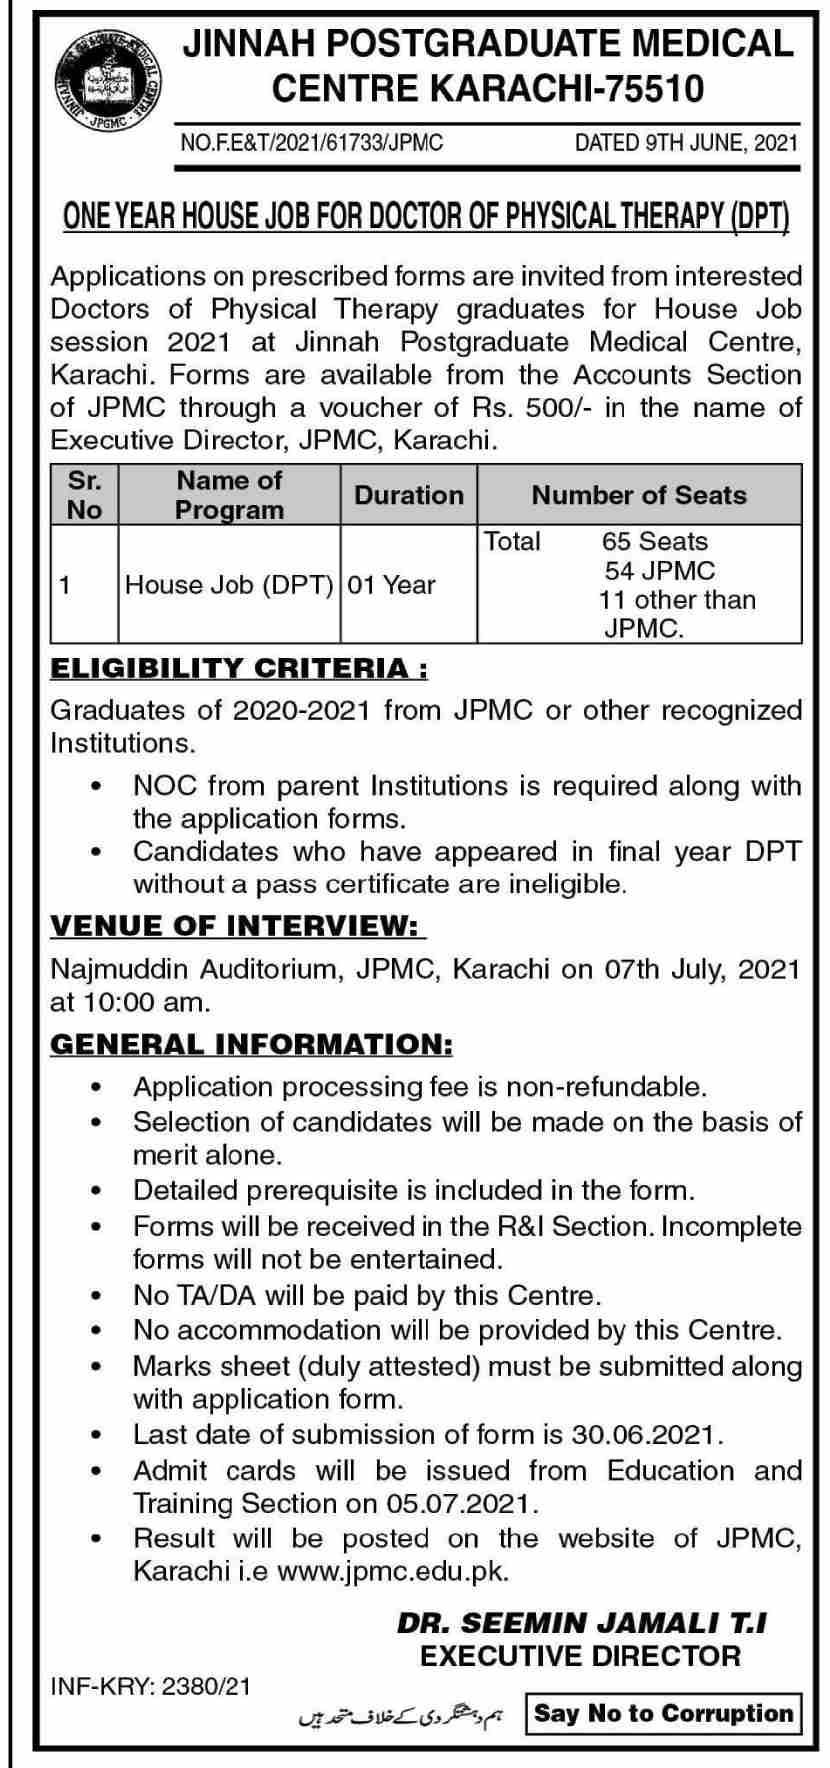 Jinnah Postgraduate Medical Centre JPMC Latest Jobs 2021 Karachi